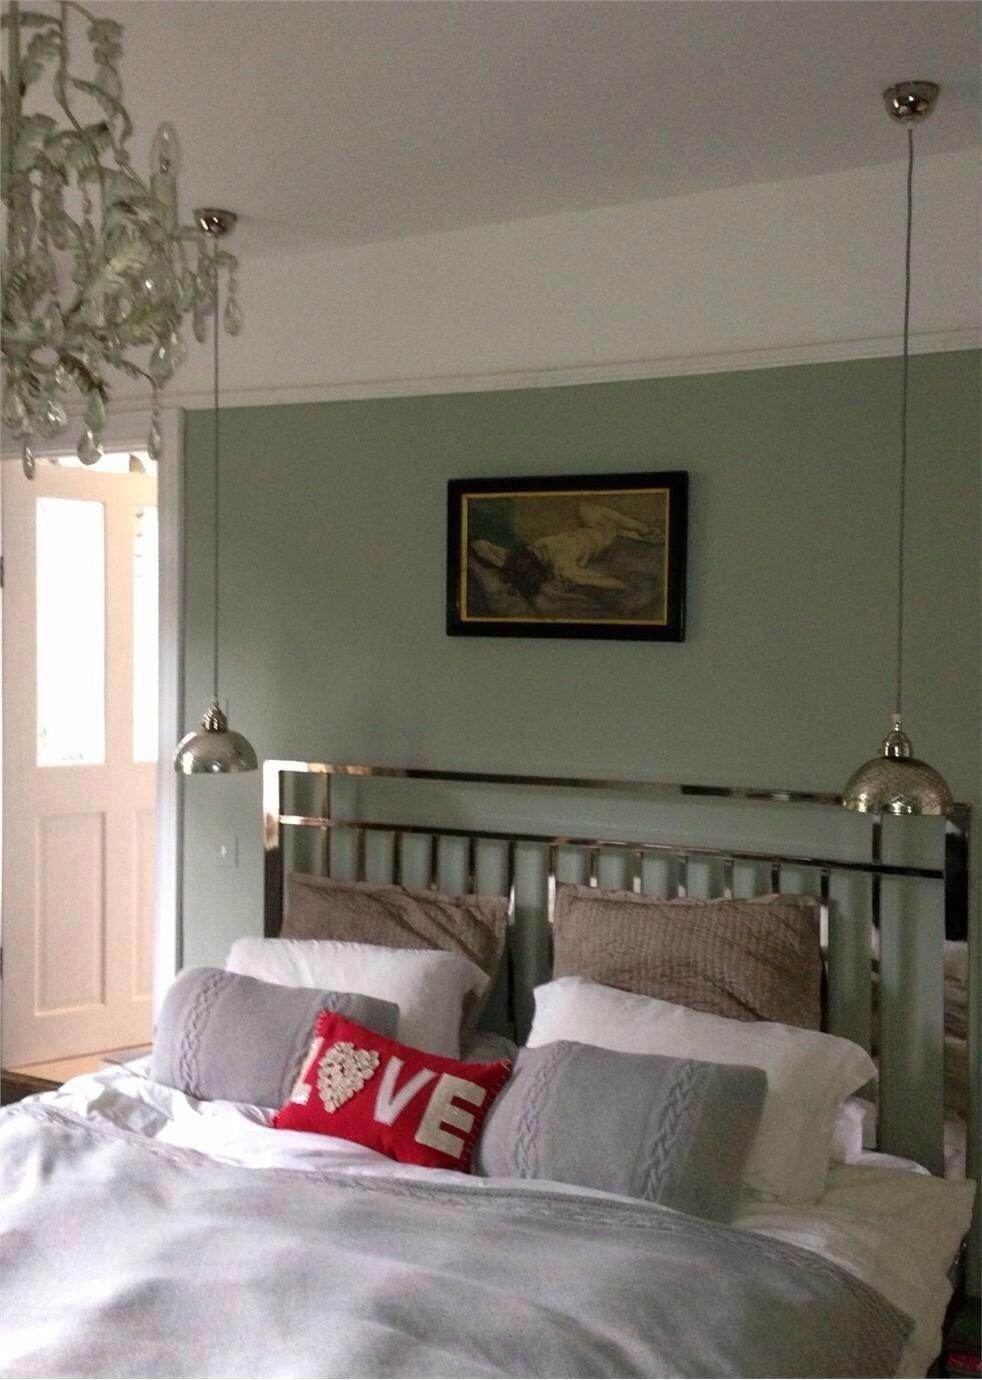 Pink Bedroom Decor Ideas Farrow and ball blue gray